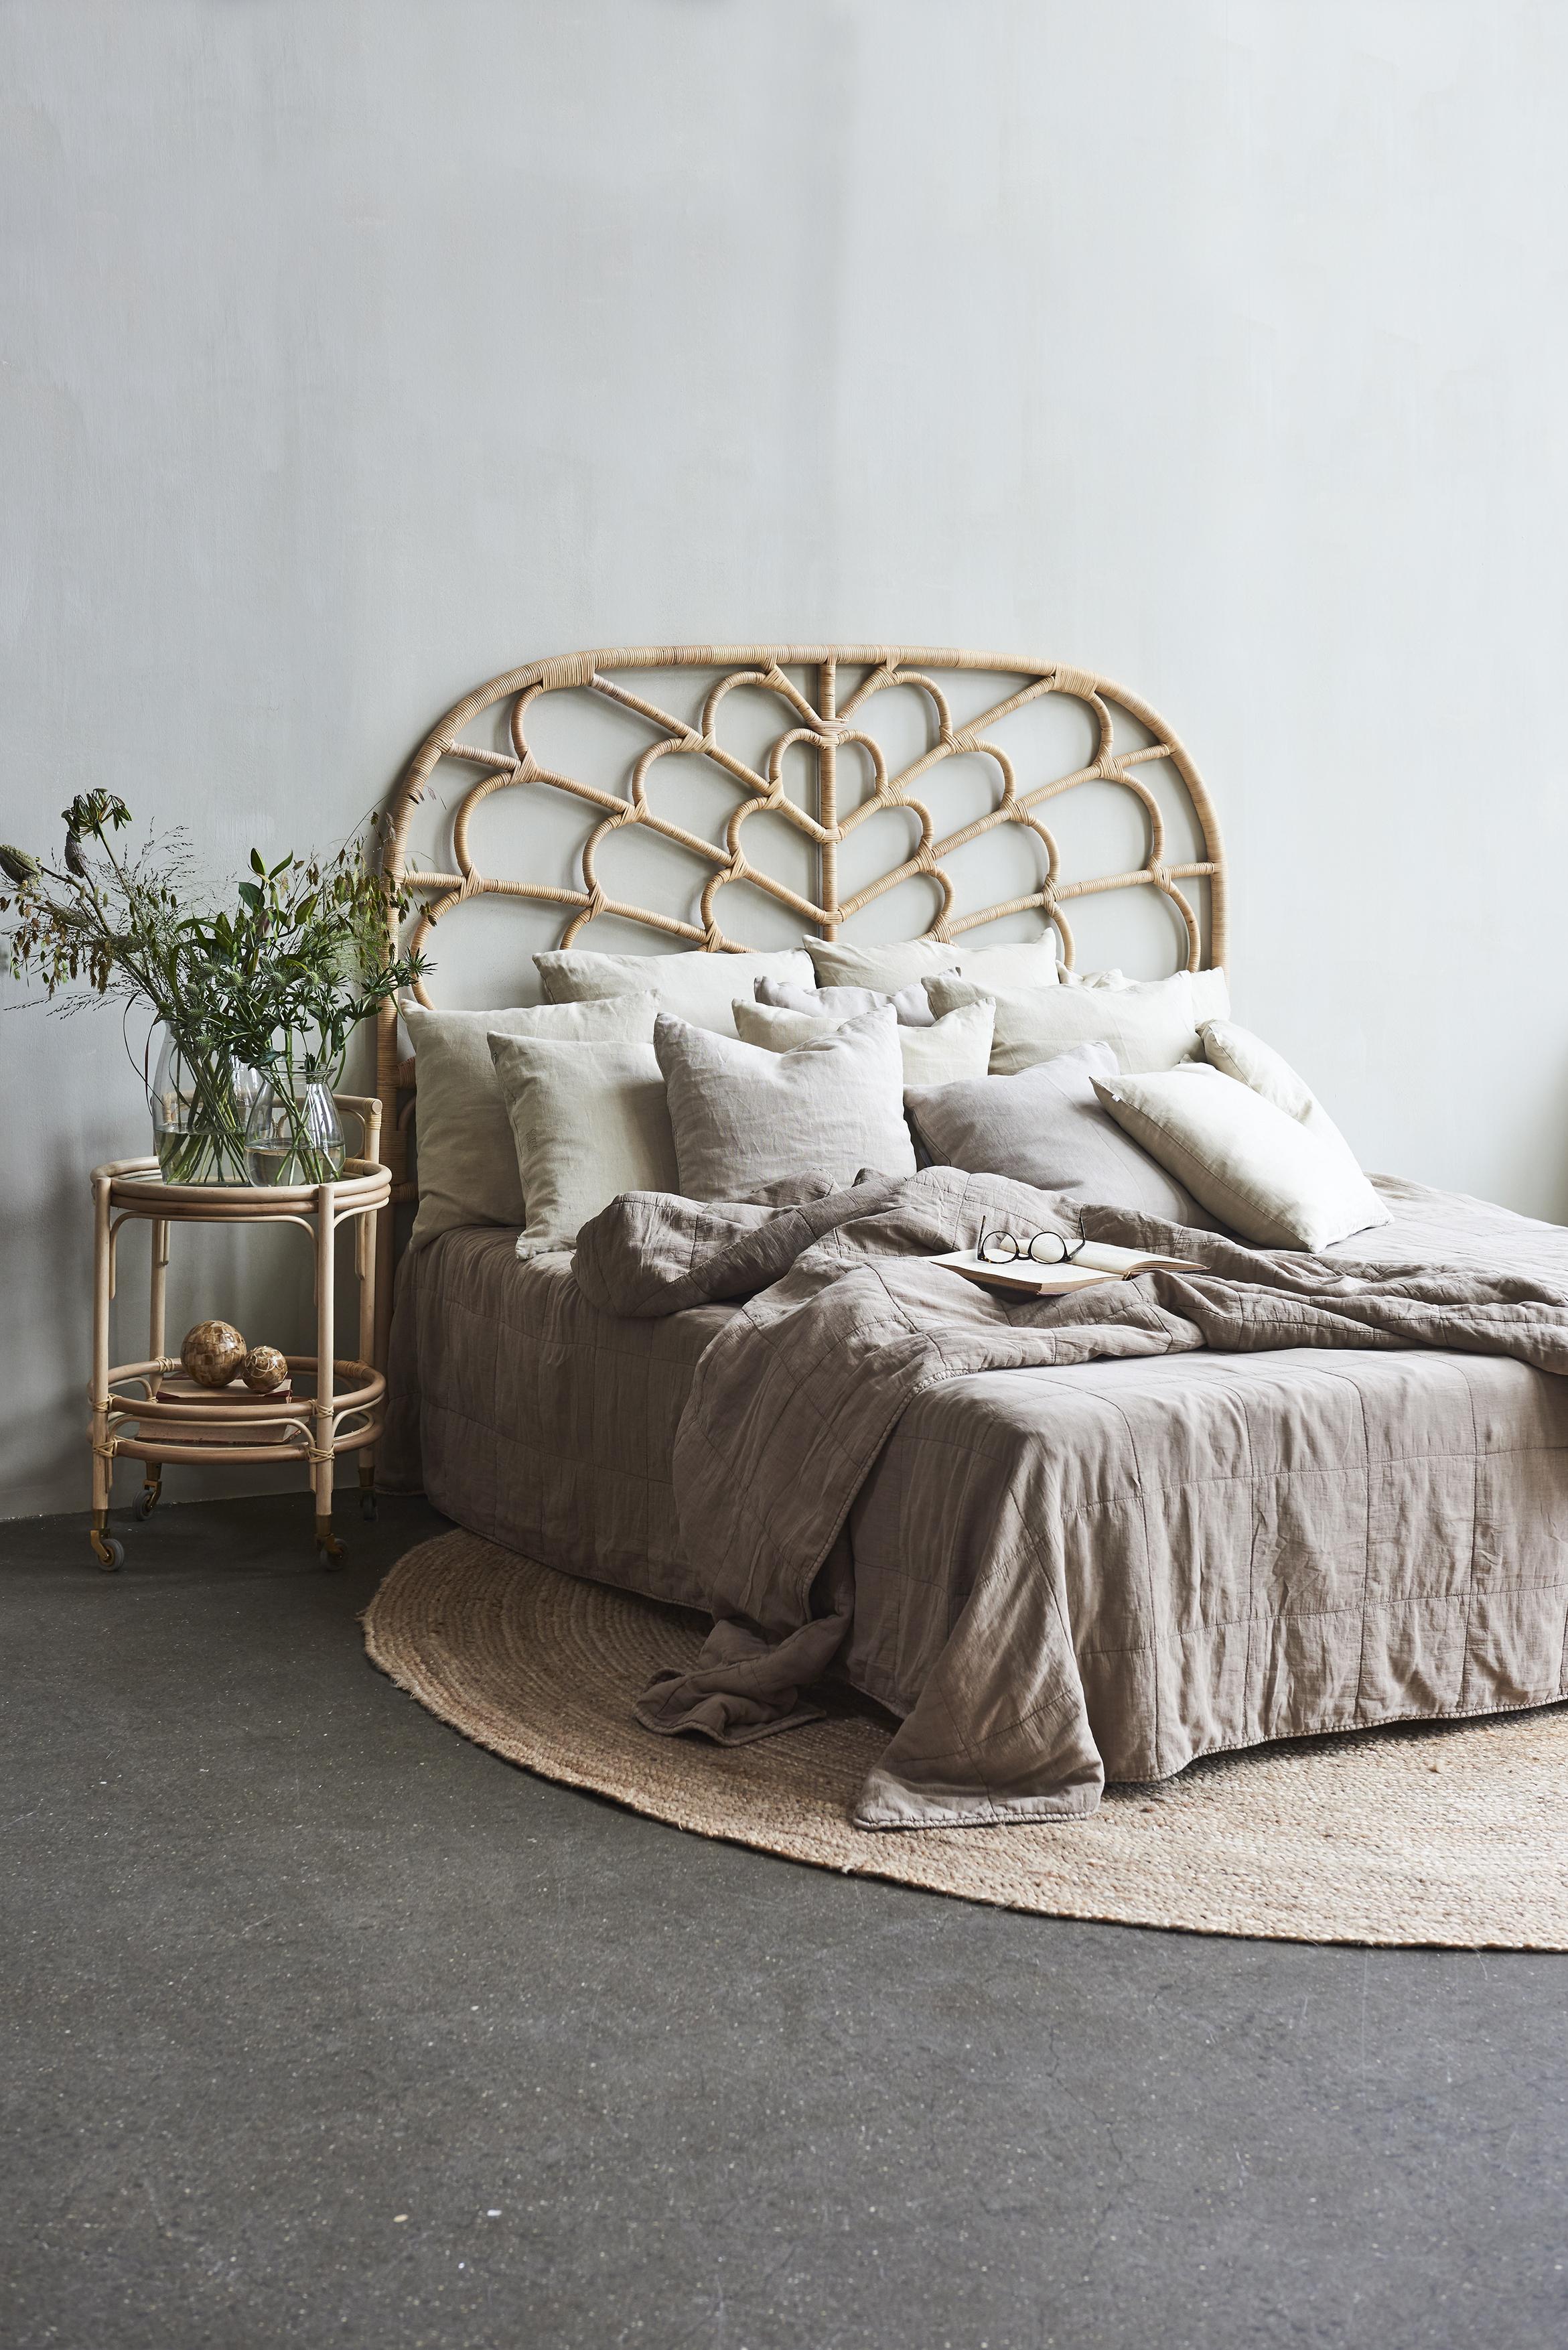 Celia headboard / Fratellino Trolley/ round braided jute rug